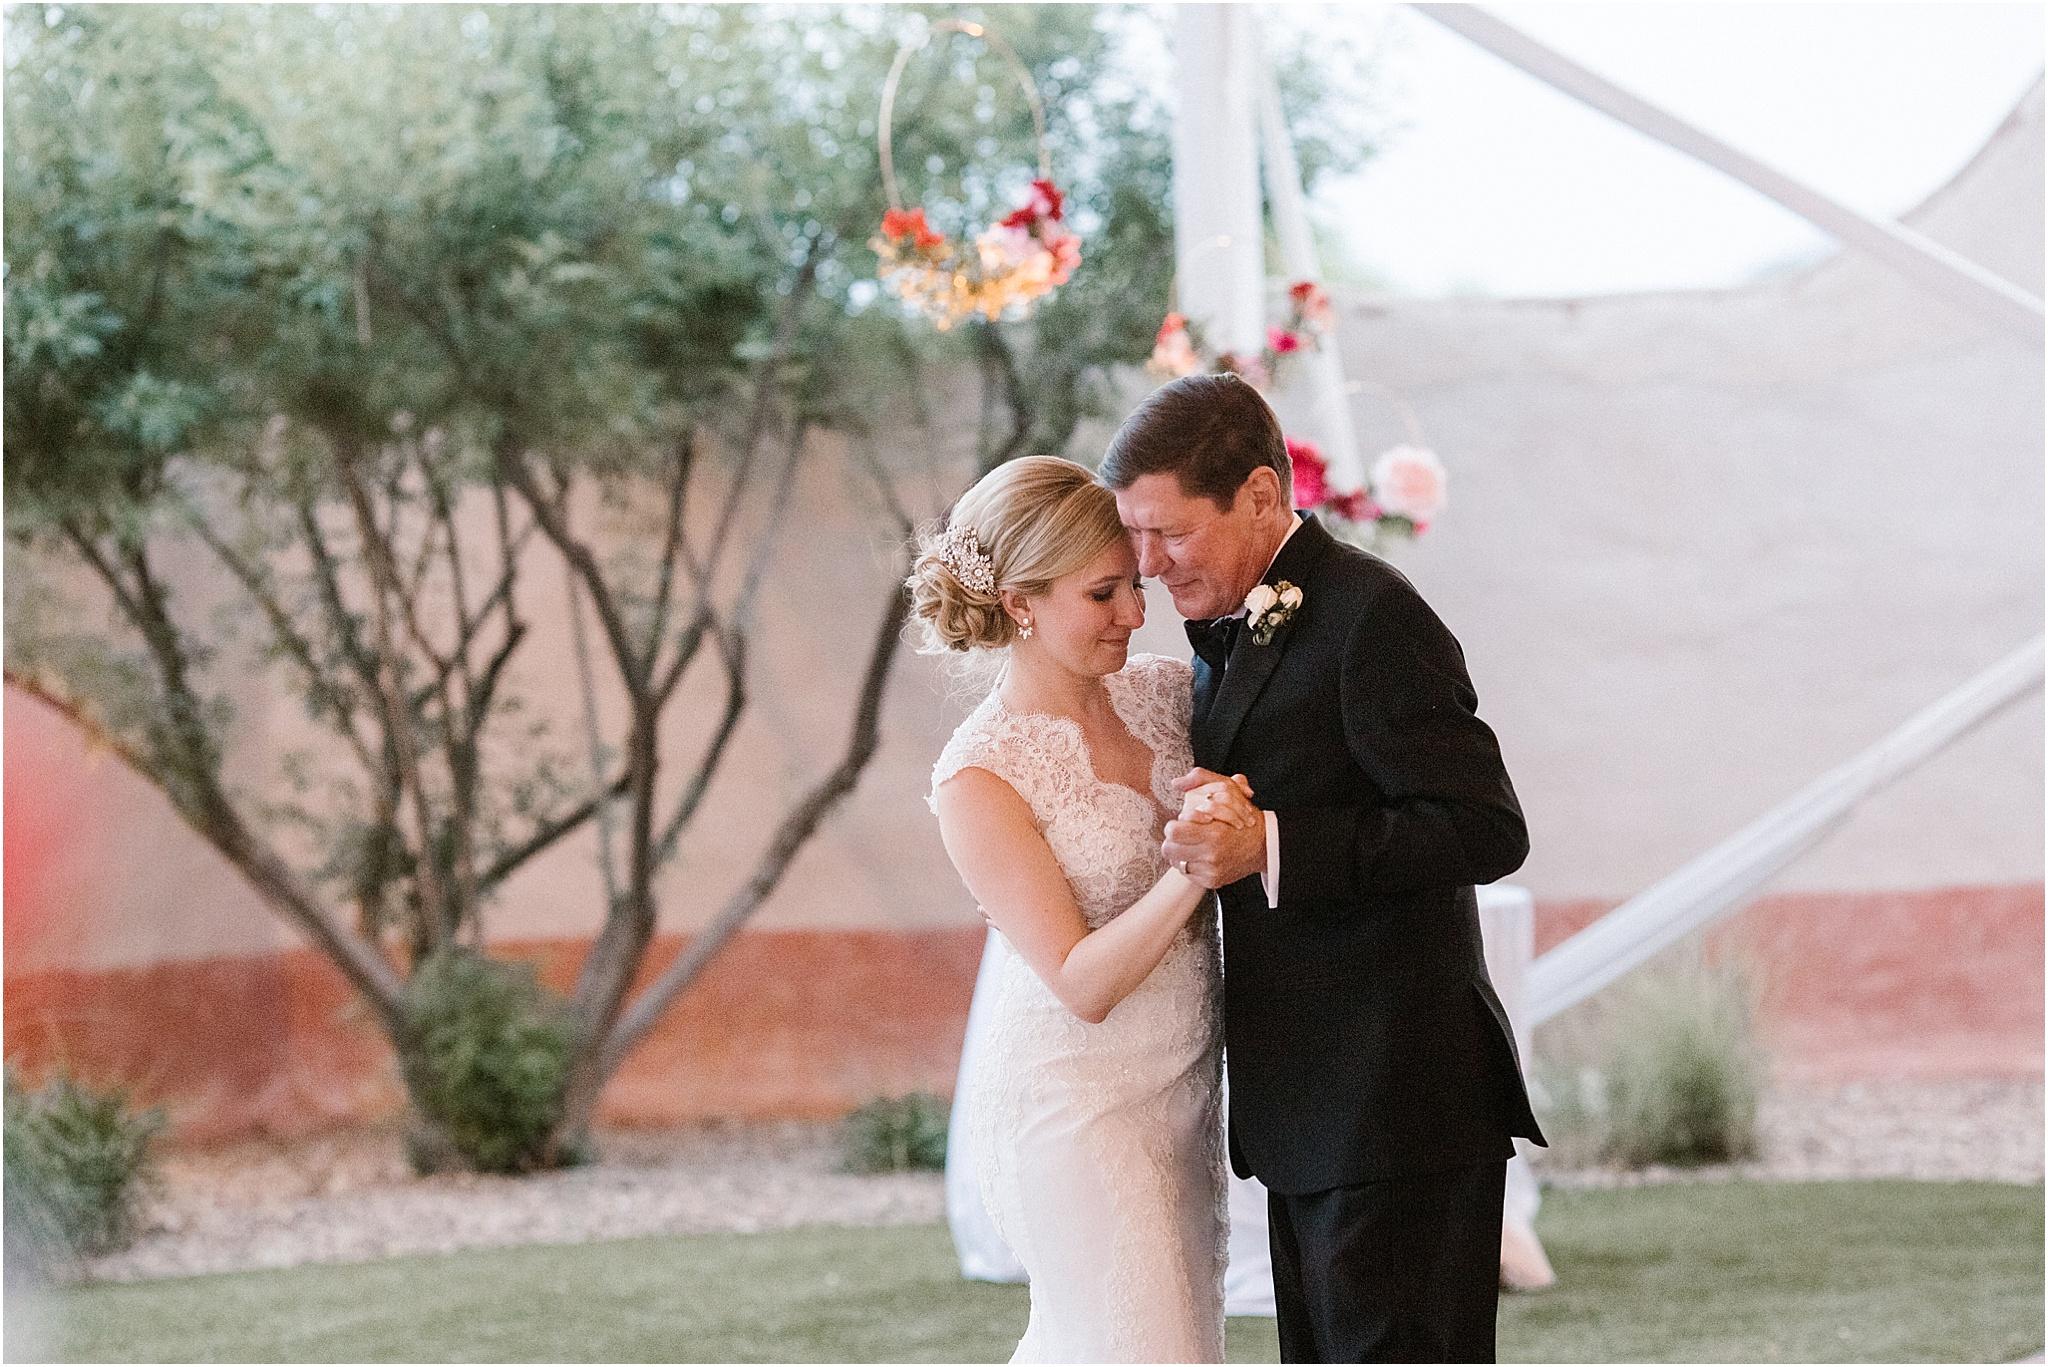 JENNA_JEROME_BLUE ROSE PHOTOGRAPHY_ABQ WEDDING_70